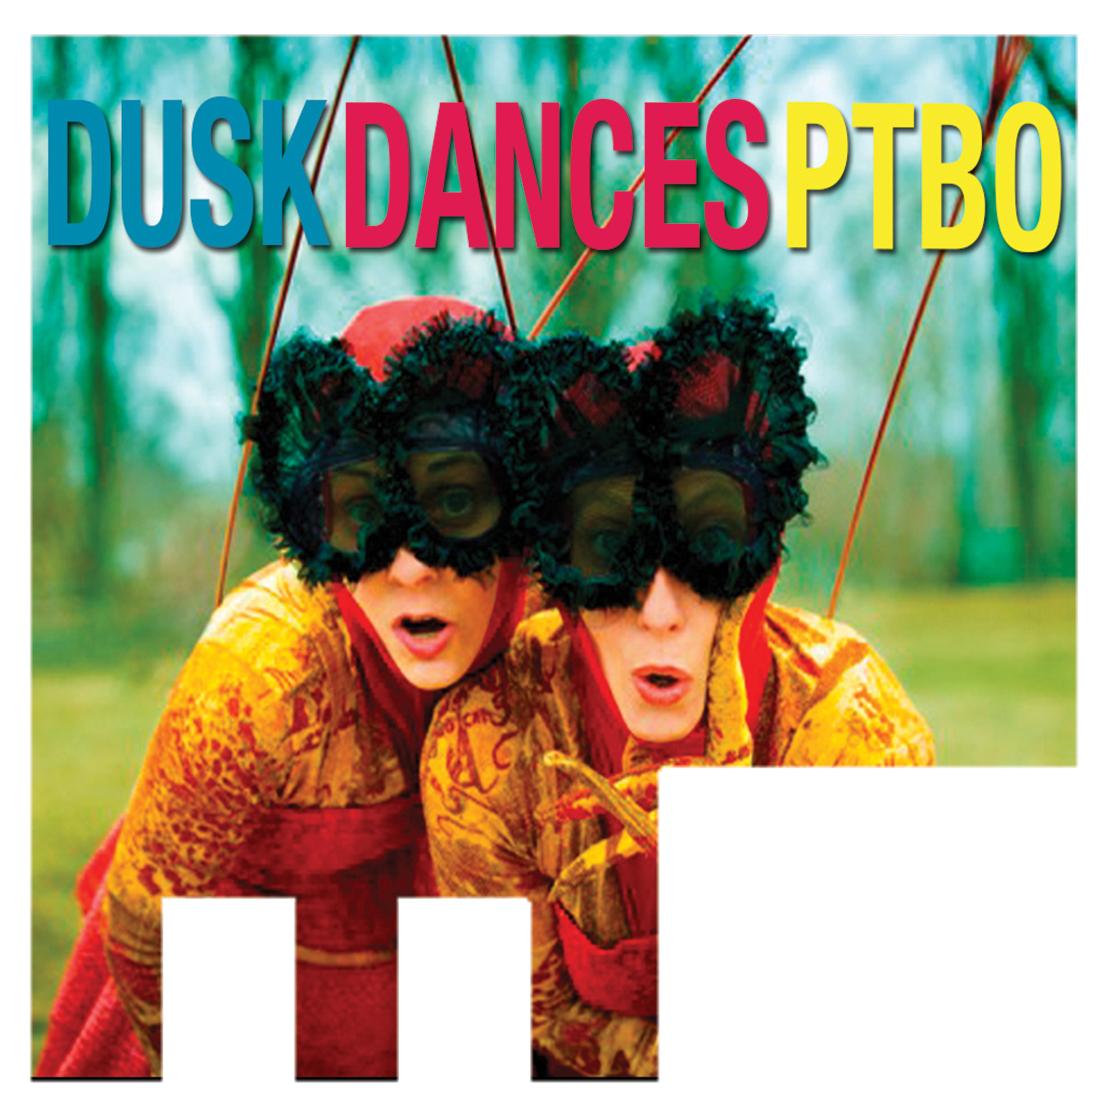 Dusk Dances 2015  in the photo.